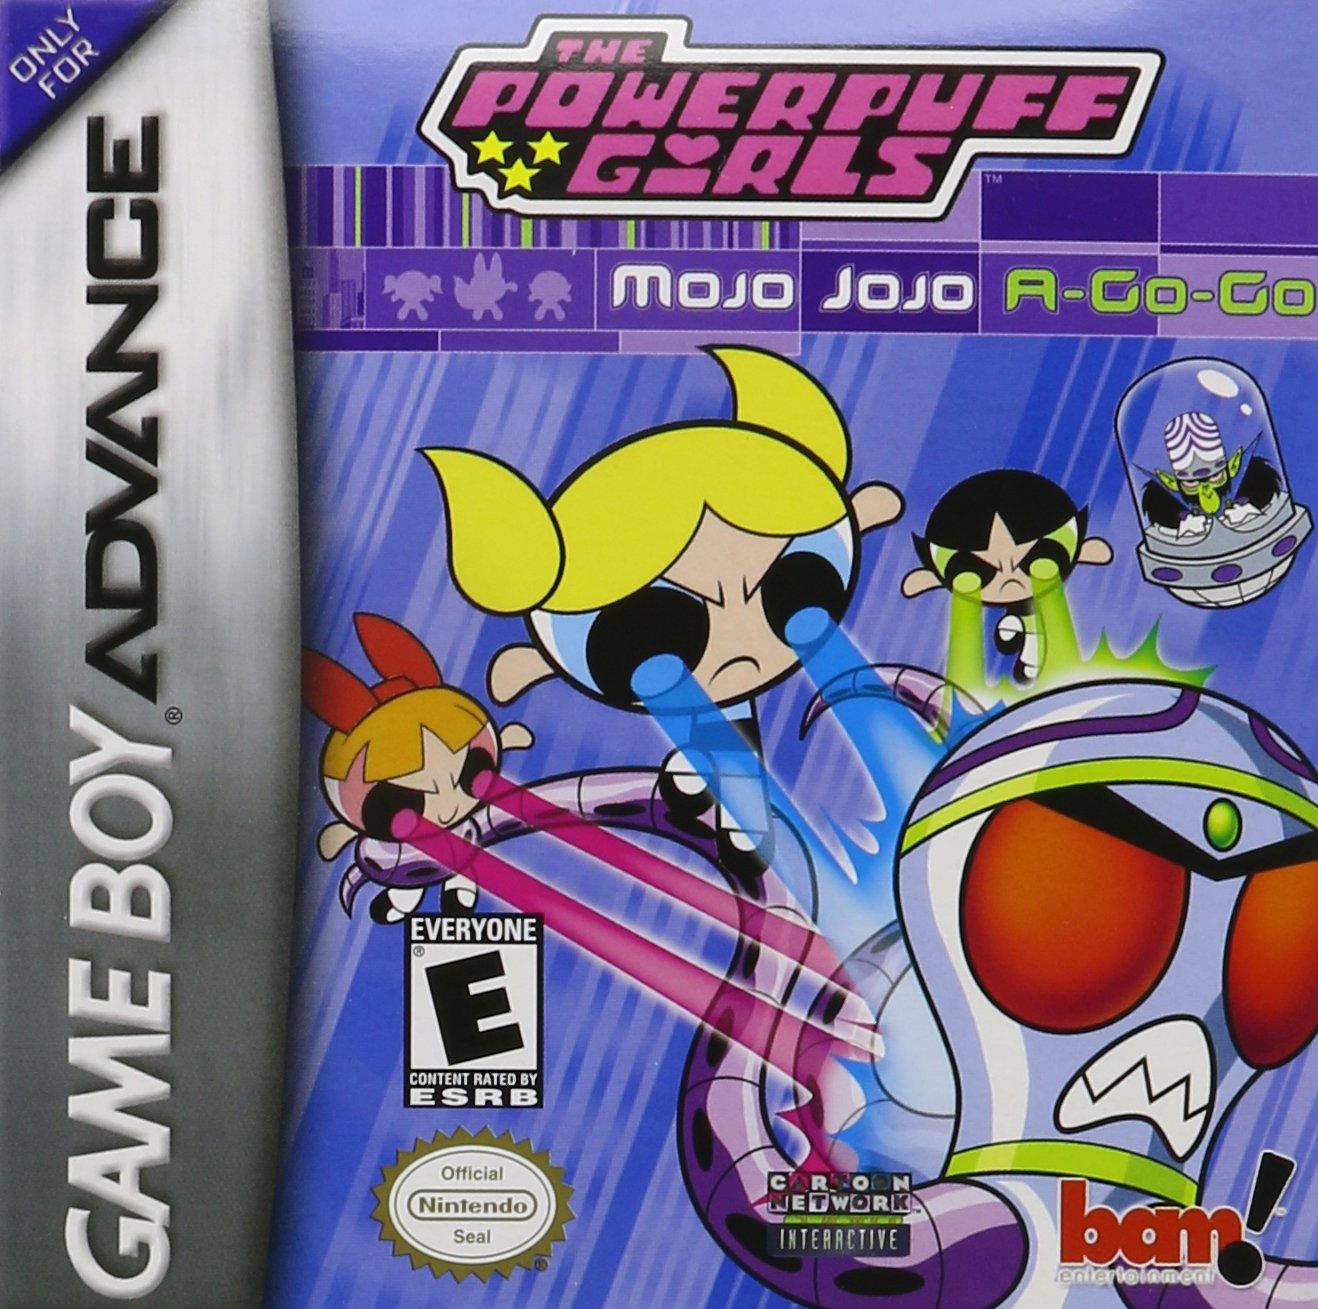 Powerpuff Girls Mojo JoJo A Go Go (輸入版) B00005MOMD